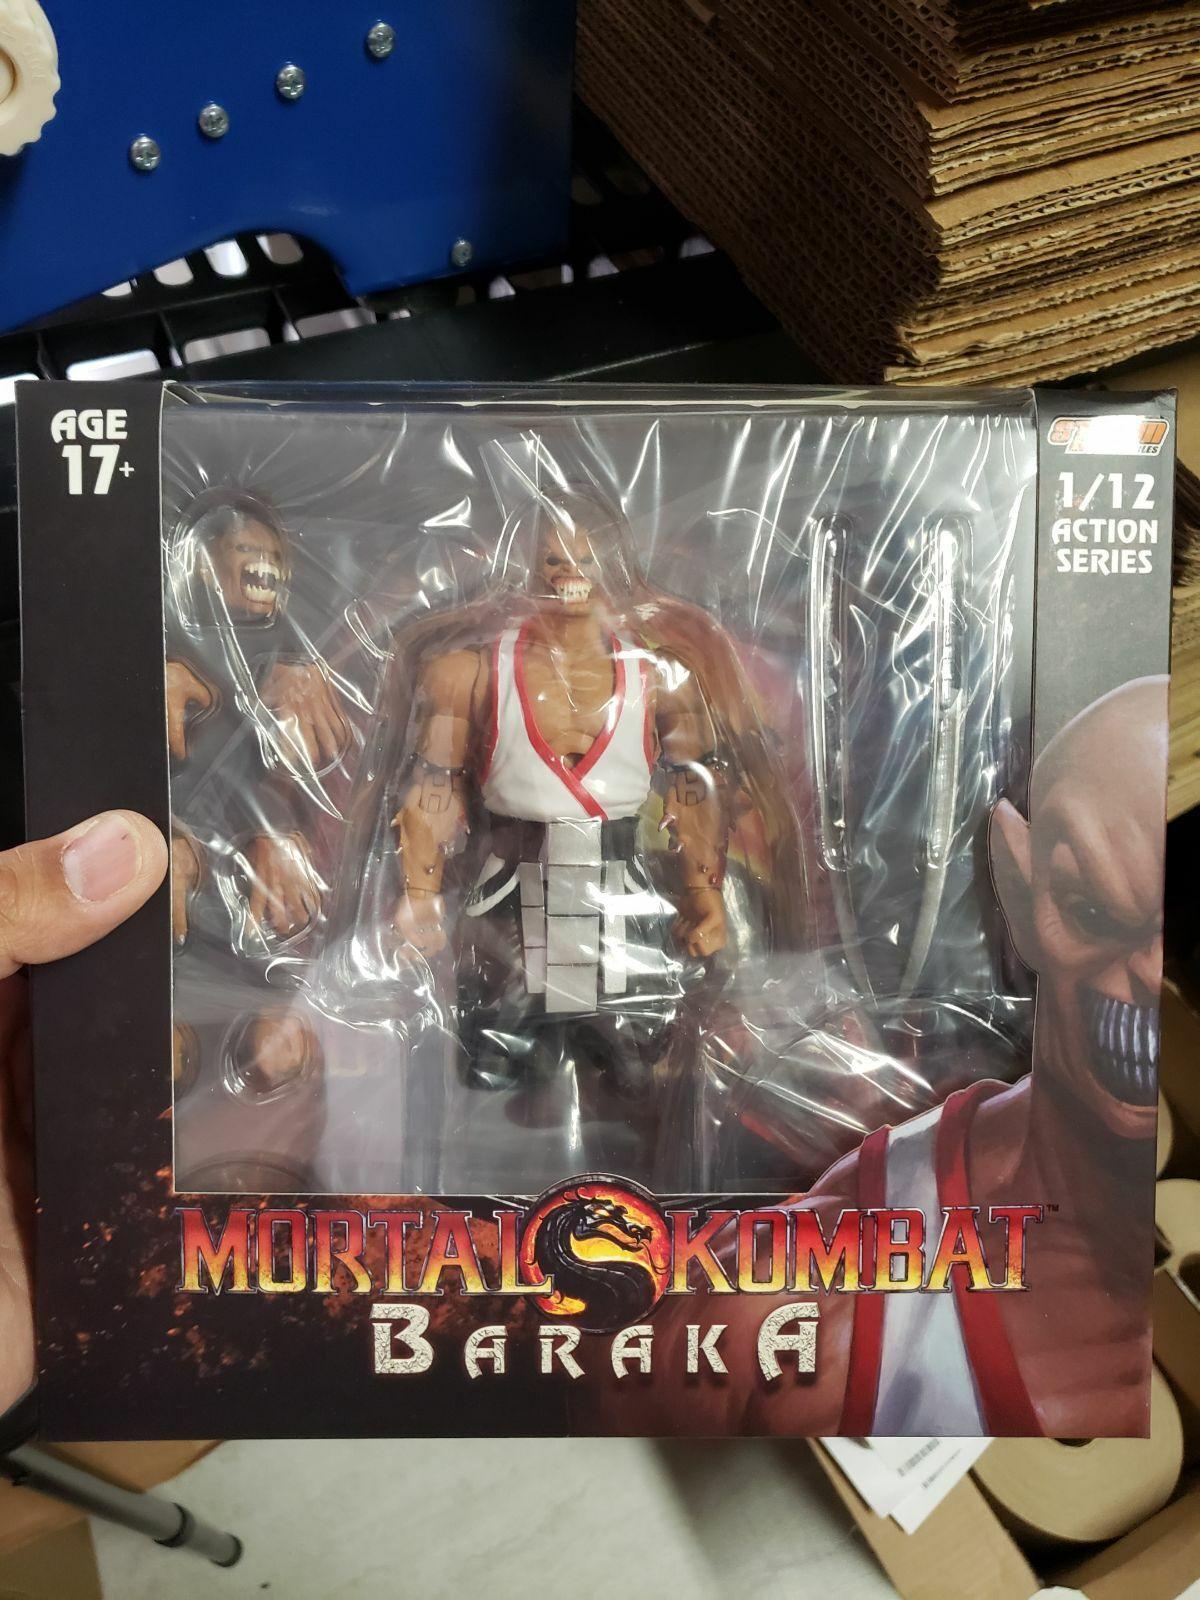 Storm Collectibles Mortal Kombat BARAKA